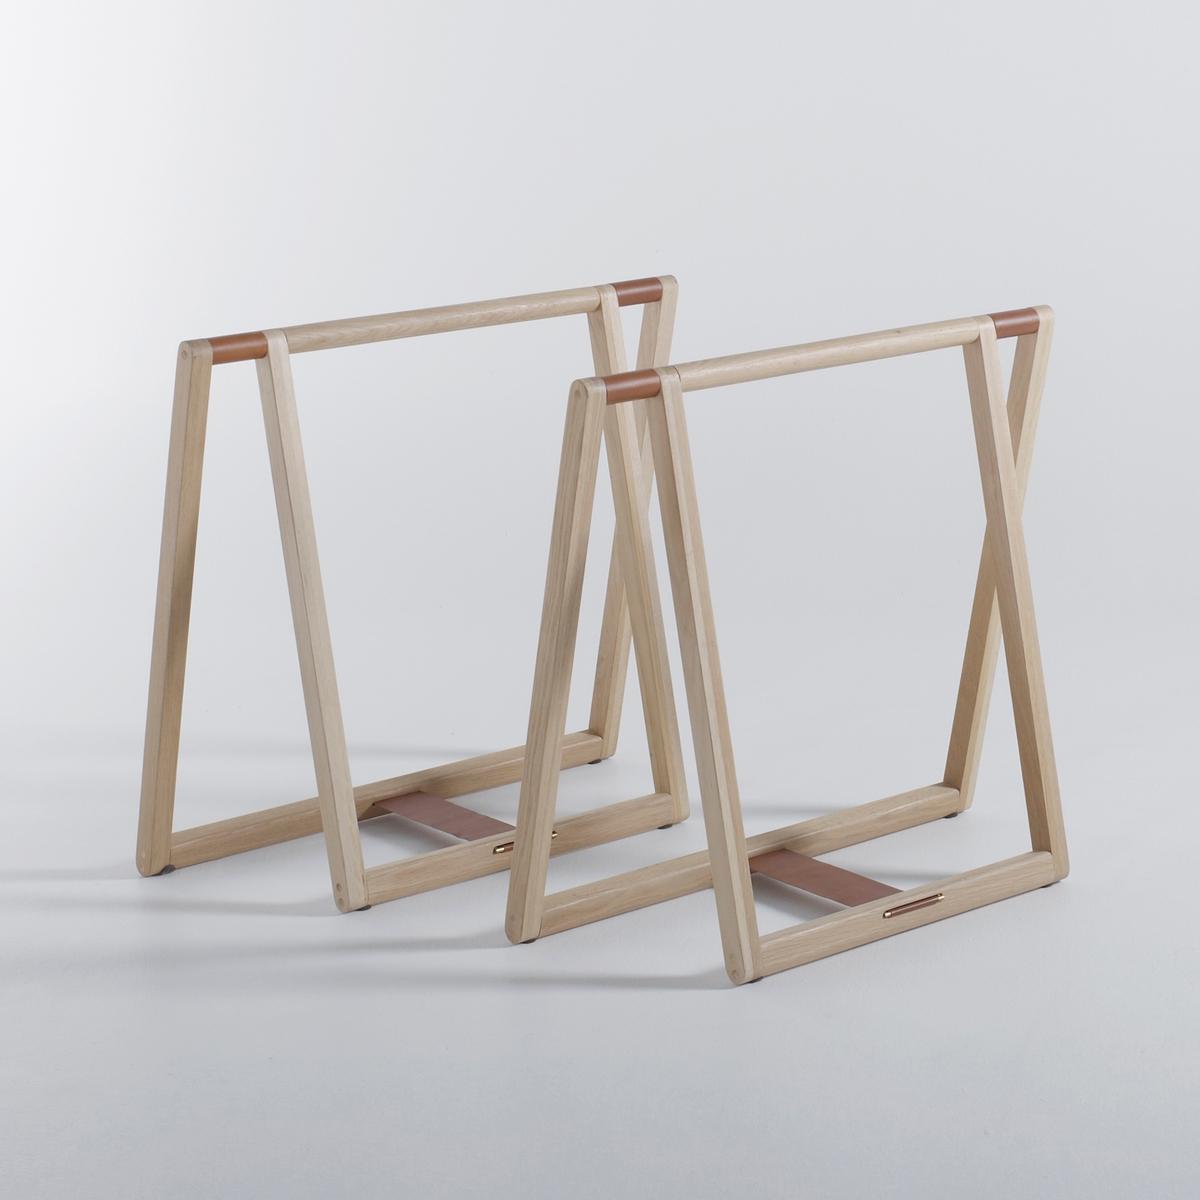 Подставки (ножки) для стола Gary, дизайн Э. Галлины